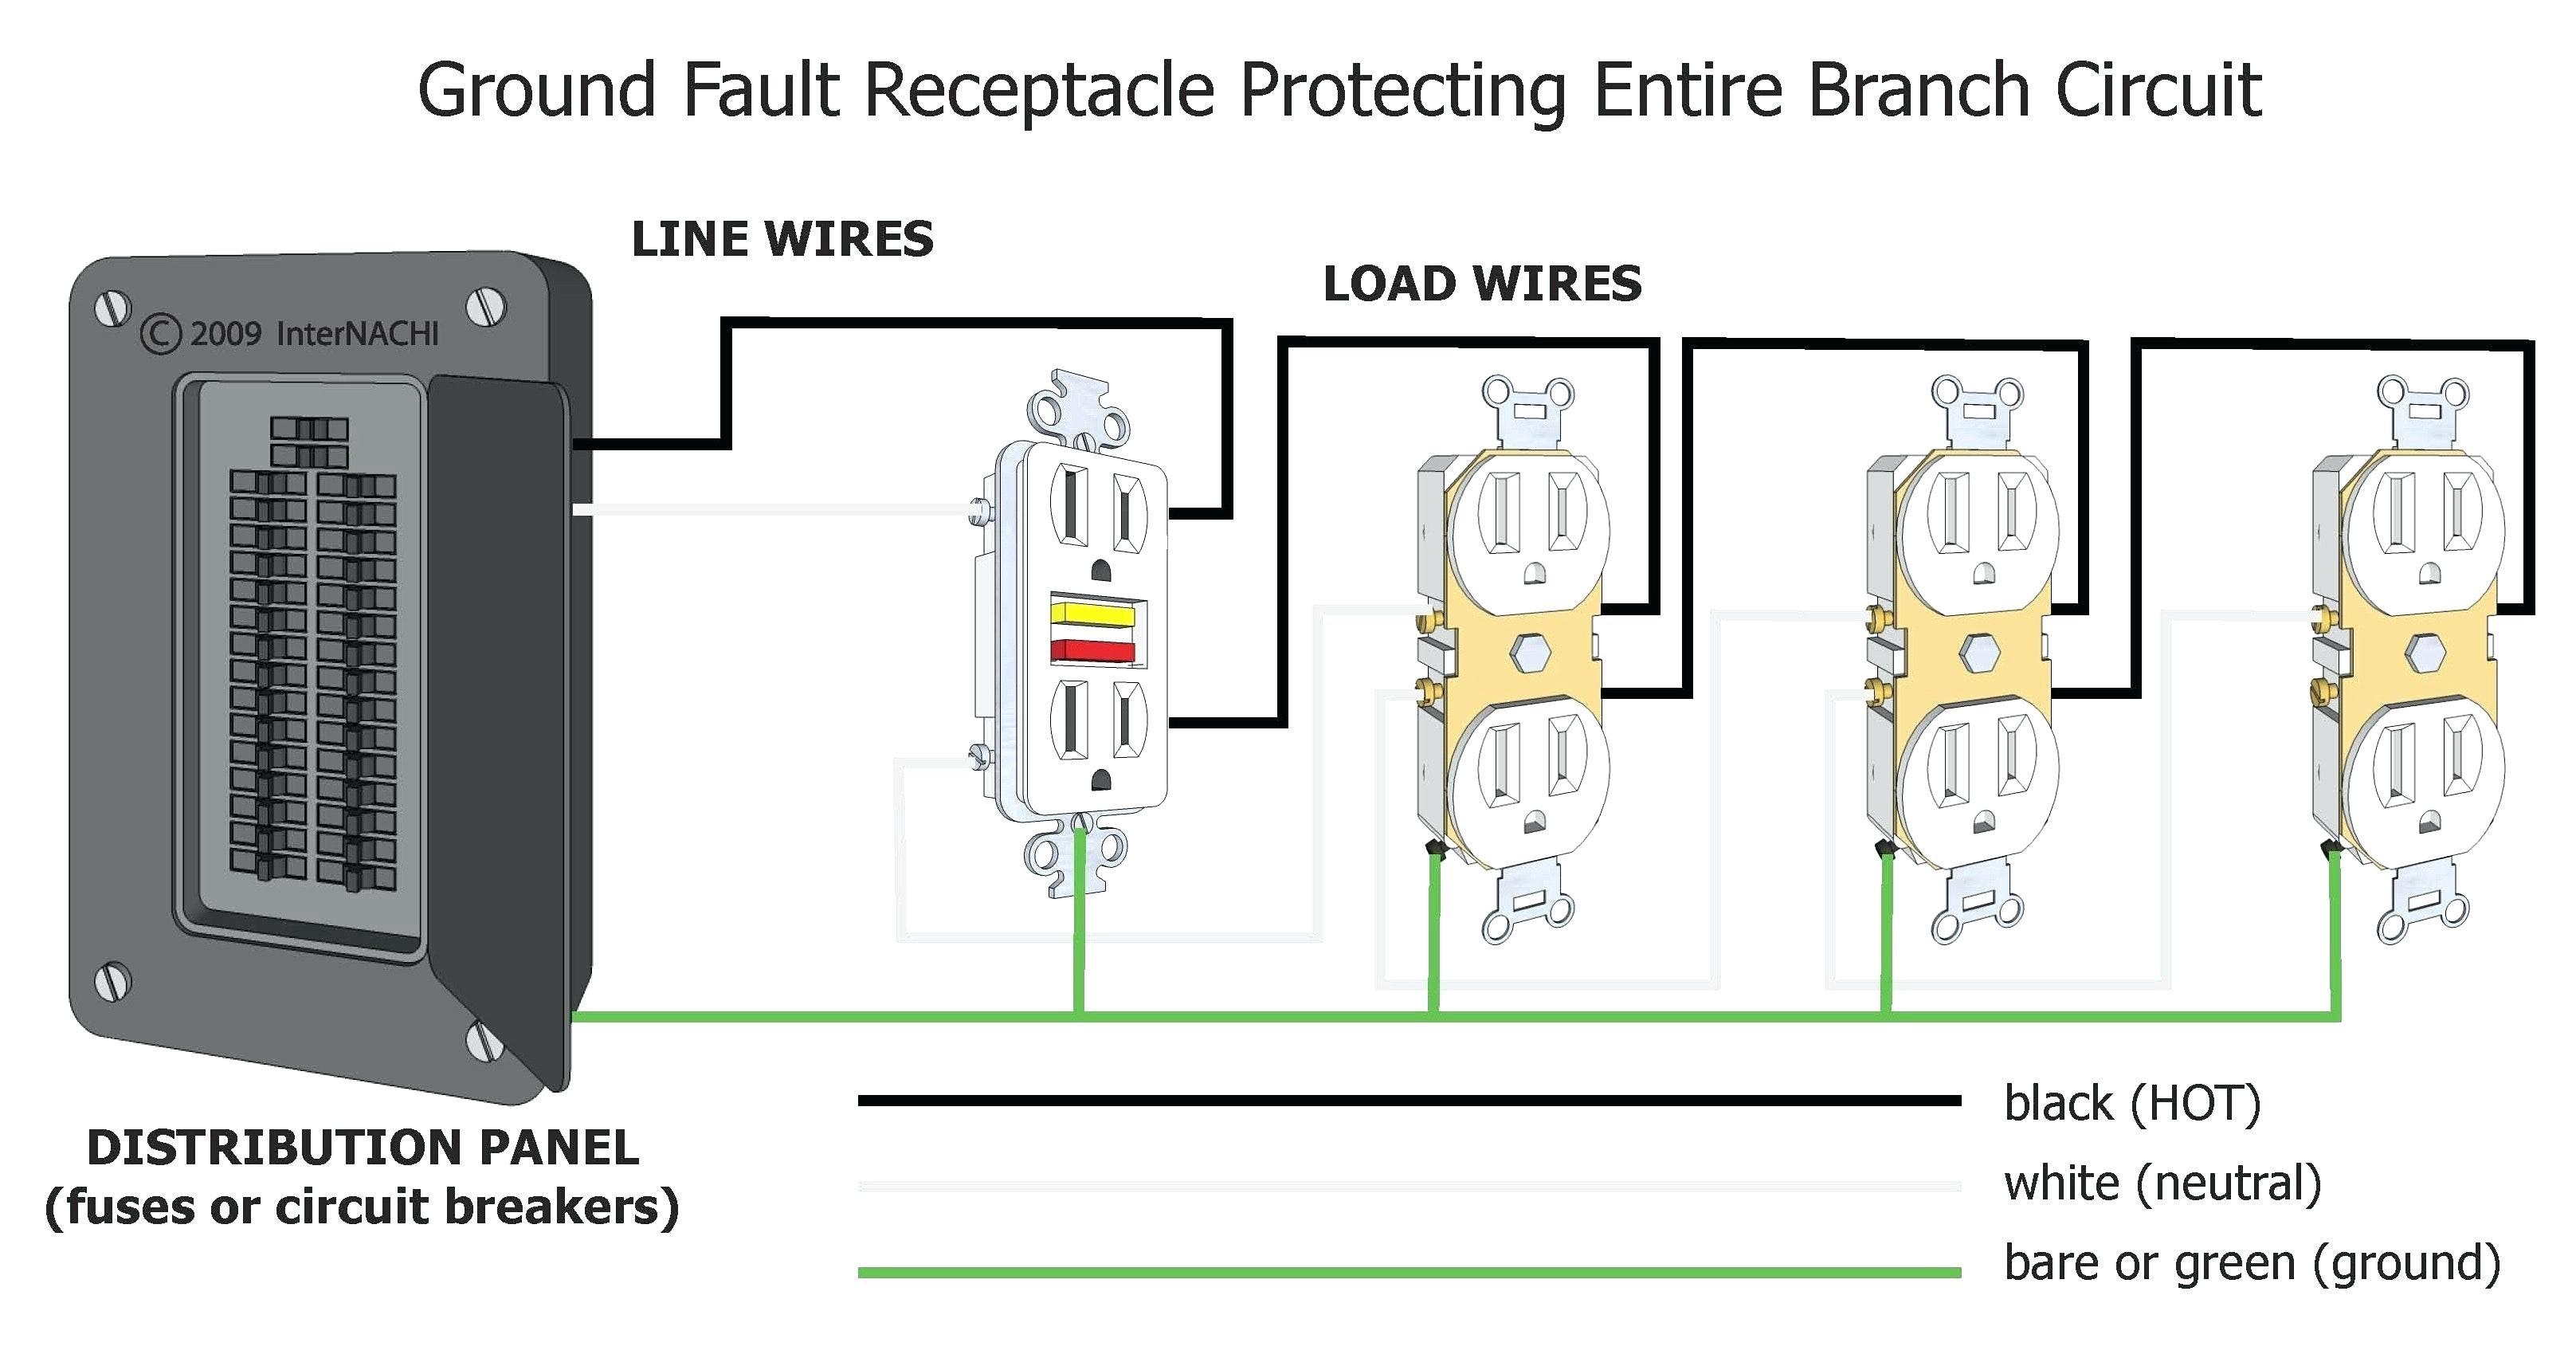 homeline breaker box wiring diagram Download-homeline breaker box wiring diagram Collection Wiring Diagram For 30 Amp Breaker Box Inspirationa Homeline DOWNLOAD Wiring Diagram 7-c